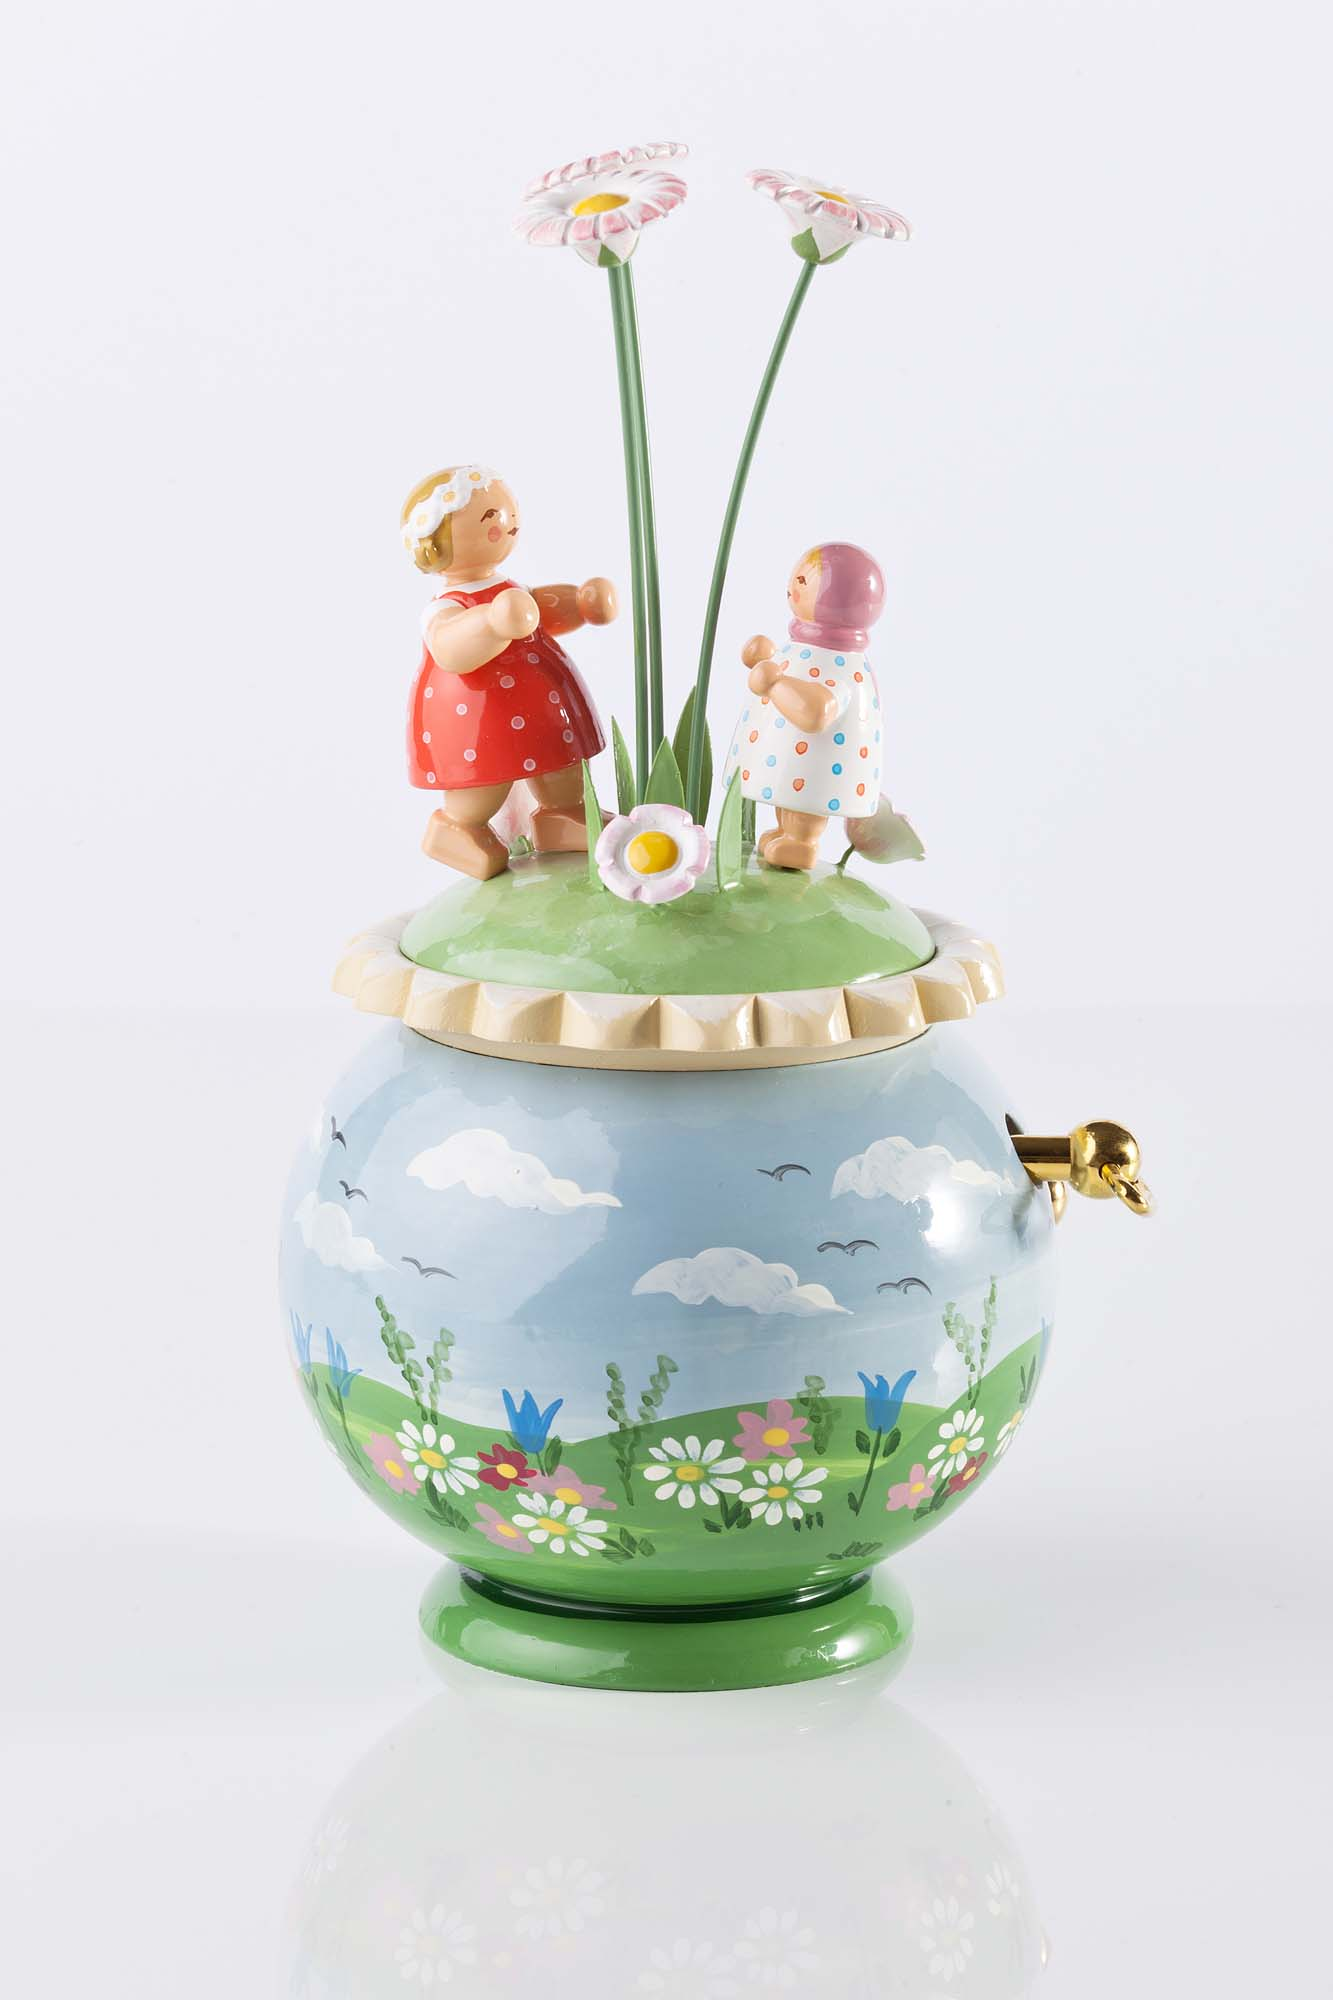 Spieldose Frühlingsreigen 5318/47AM